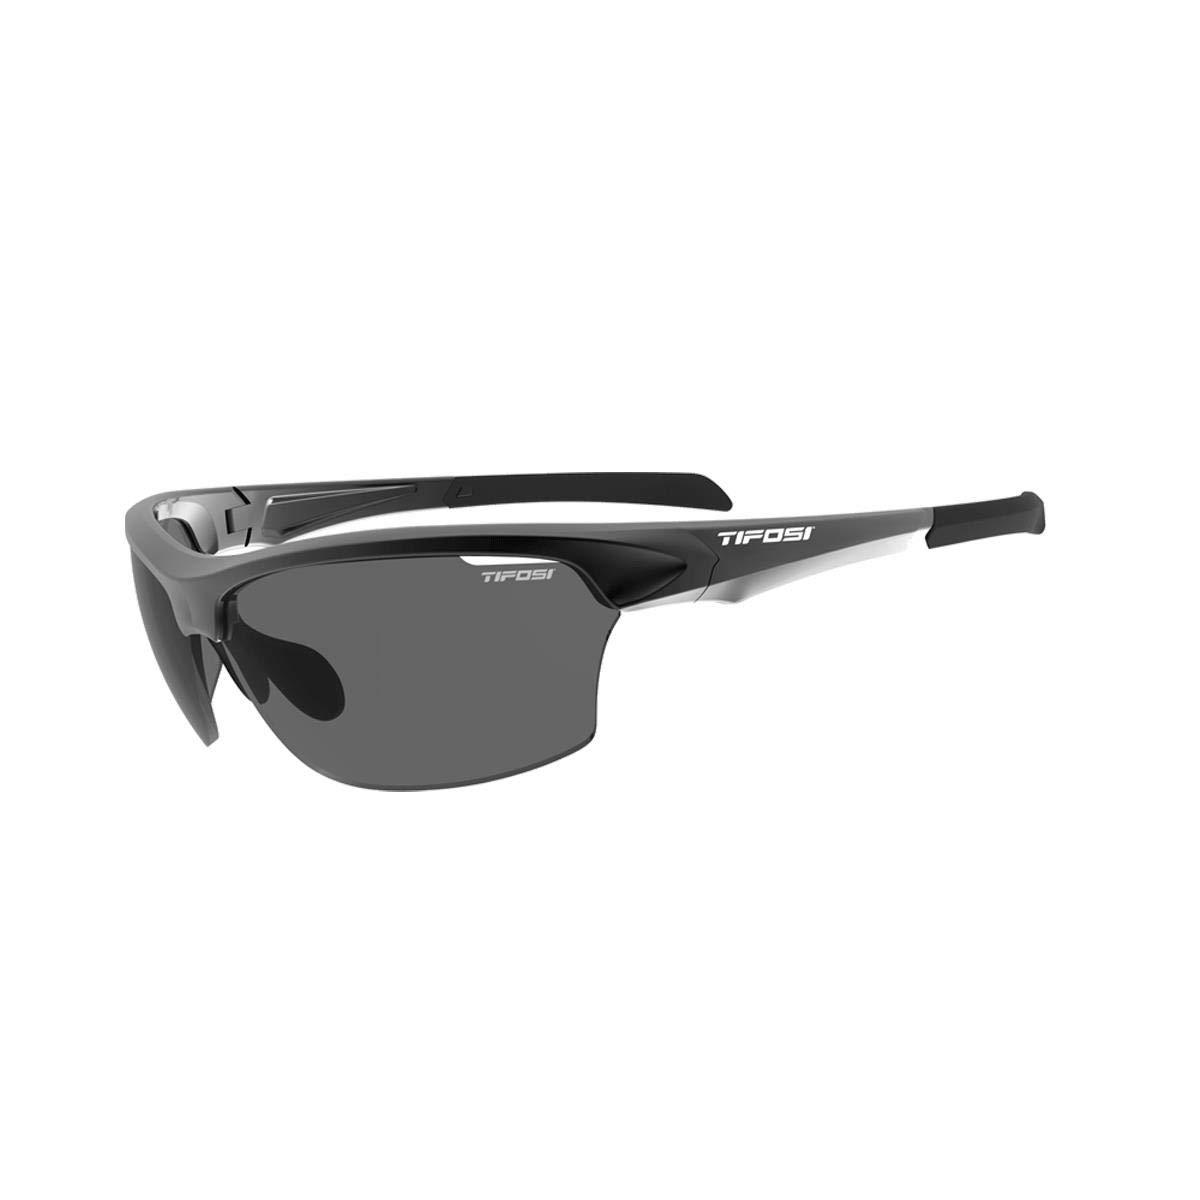 b05672f0a4 Amazon.com  Tifosi Intense Golf Sunglasses Black Grey  Clothing